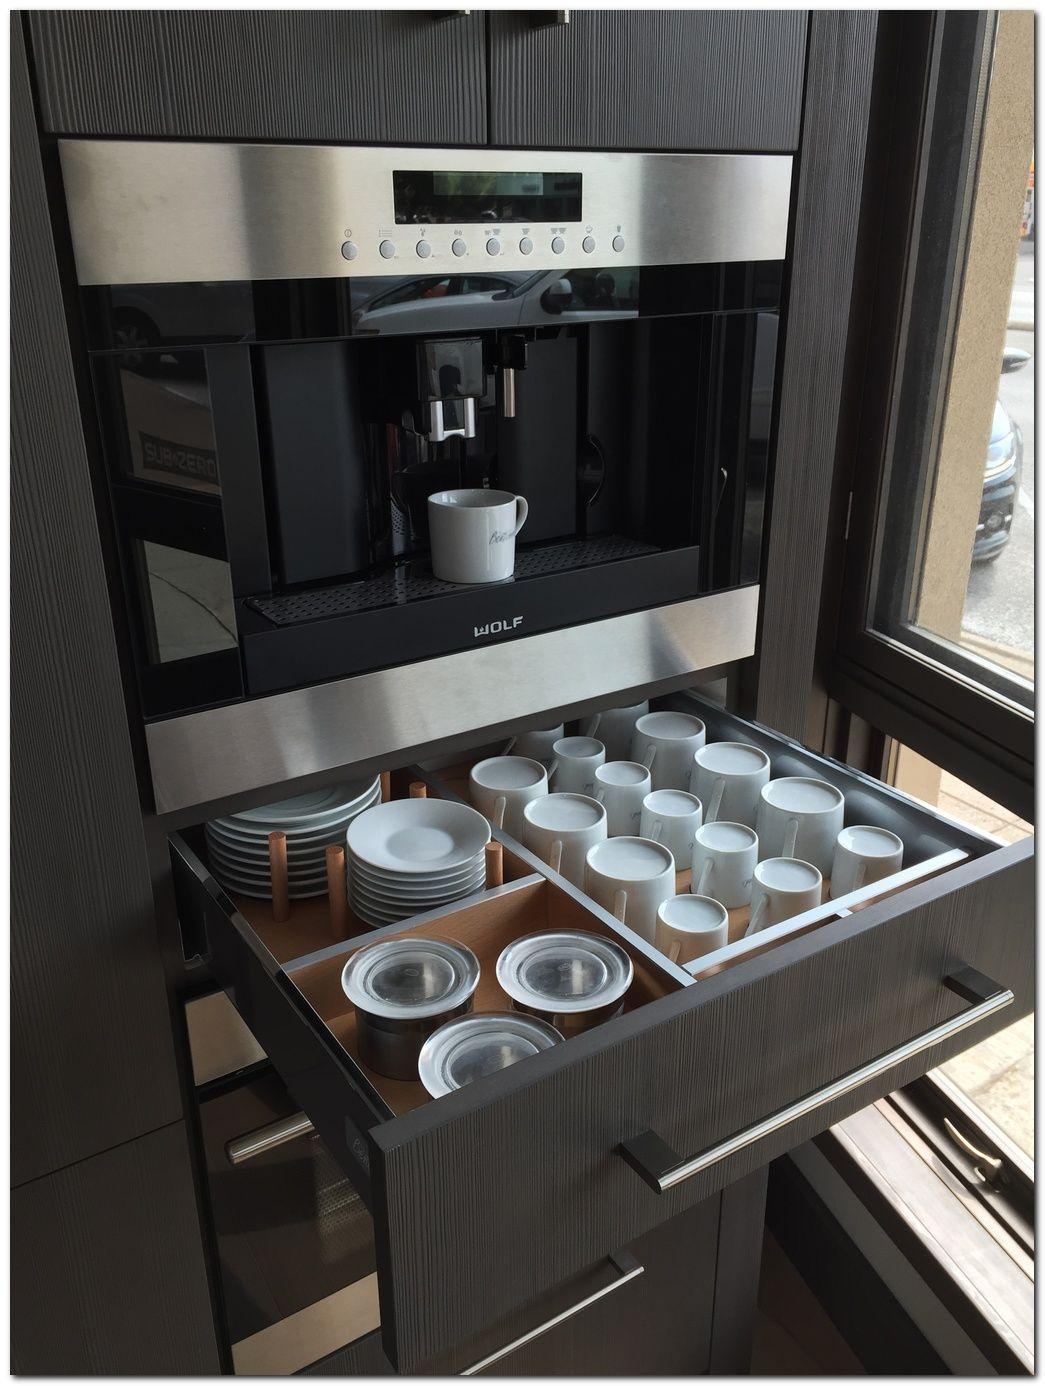 100 Ideas To Make Coffee Maker As Unique Interior